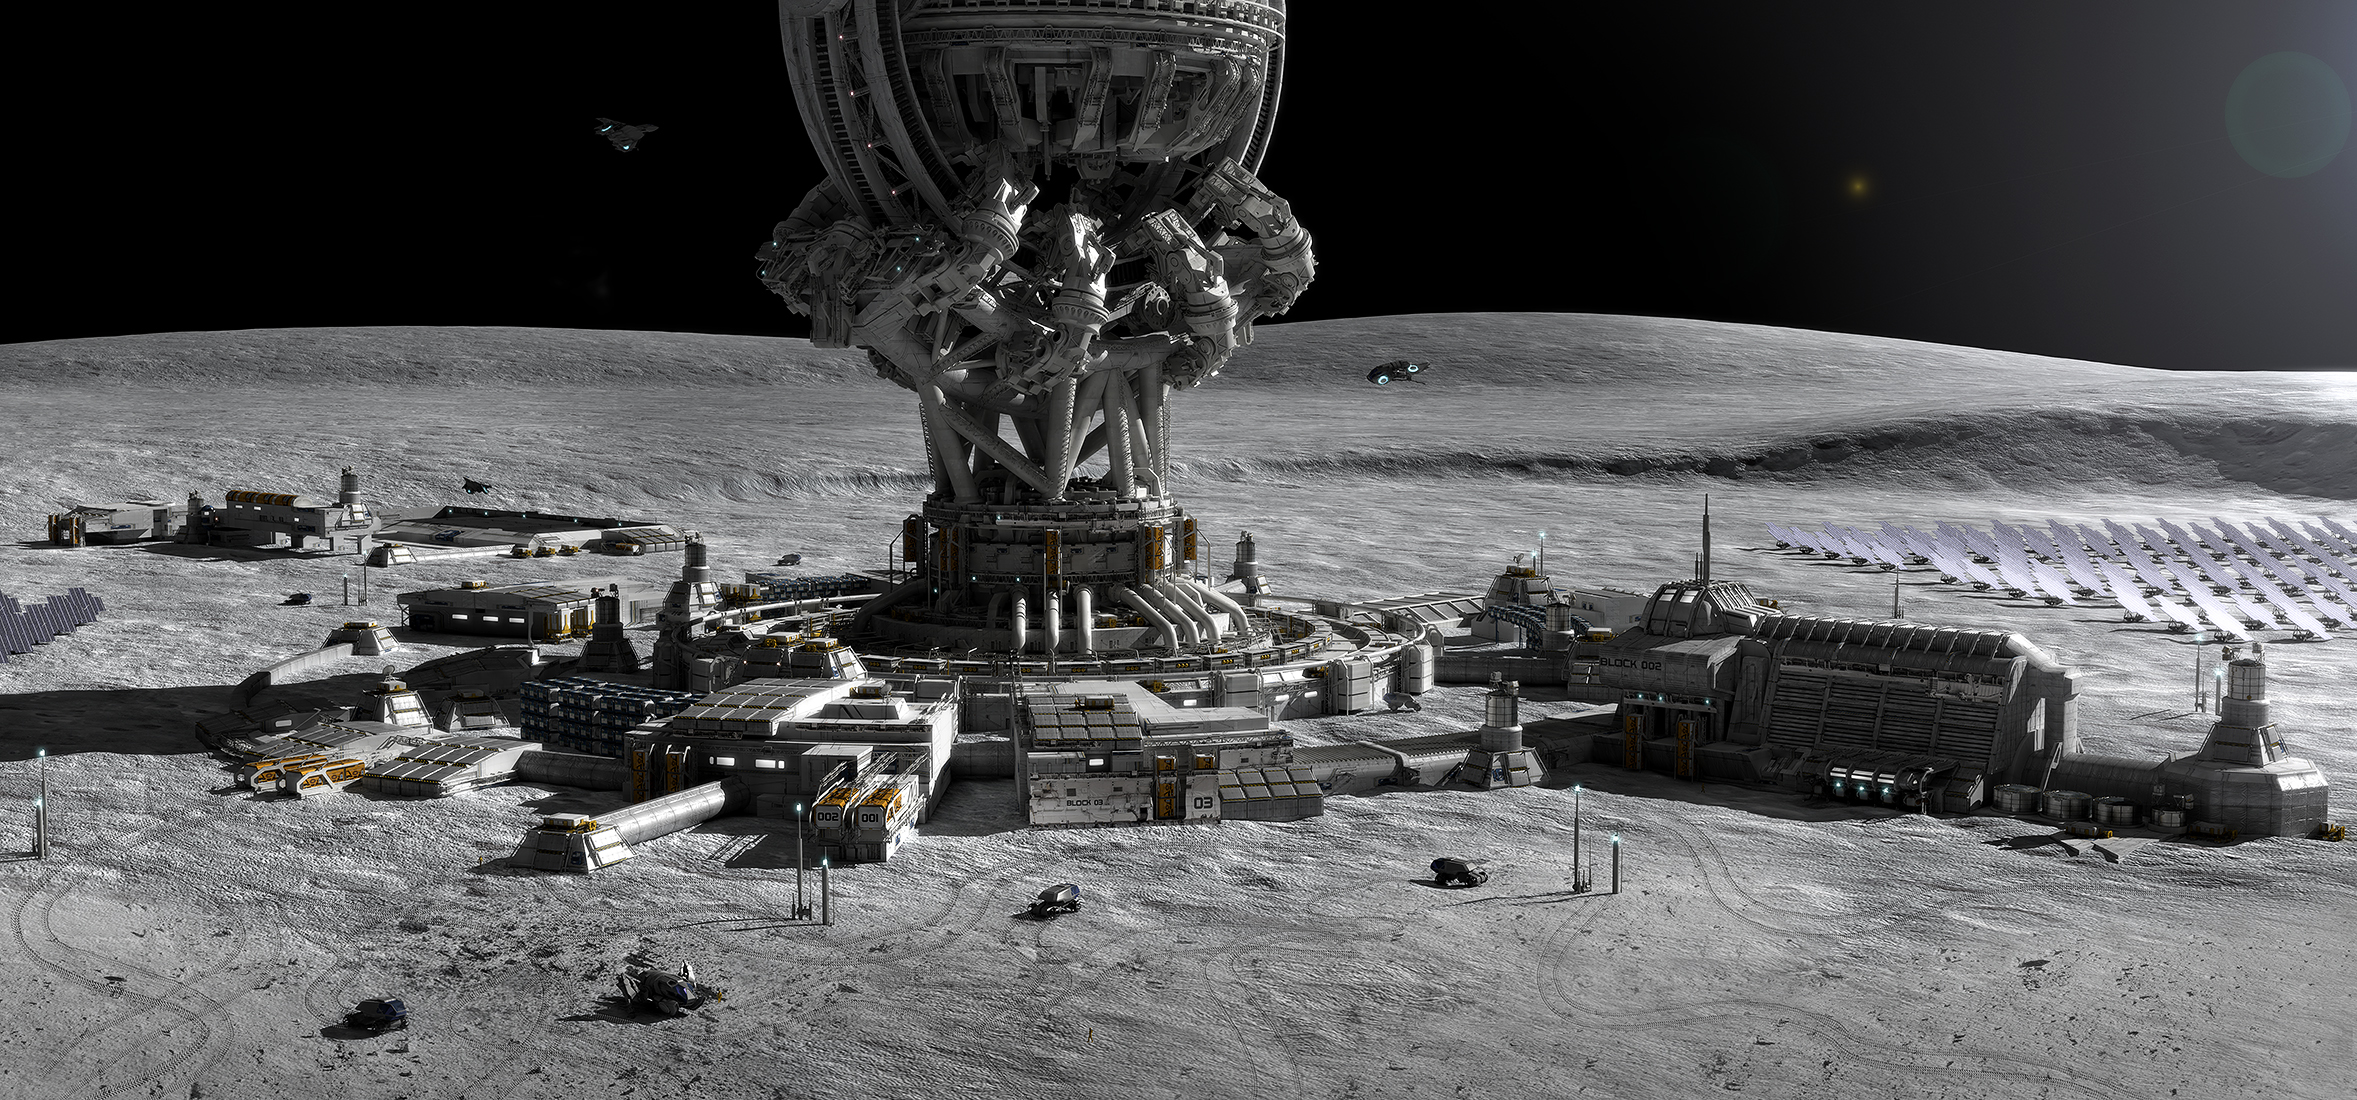 MoonBase_042015_FDM_Base_v005_websiteSMALL.jpg